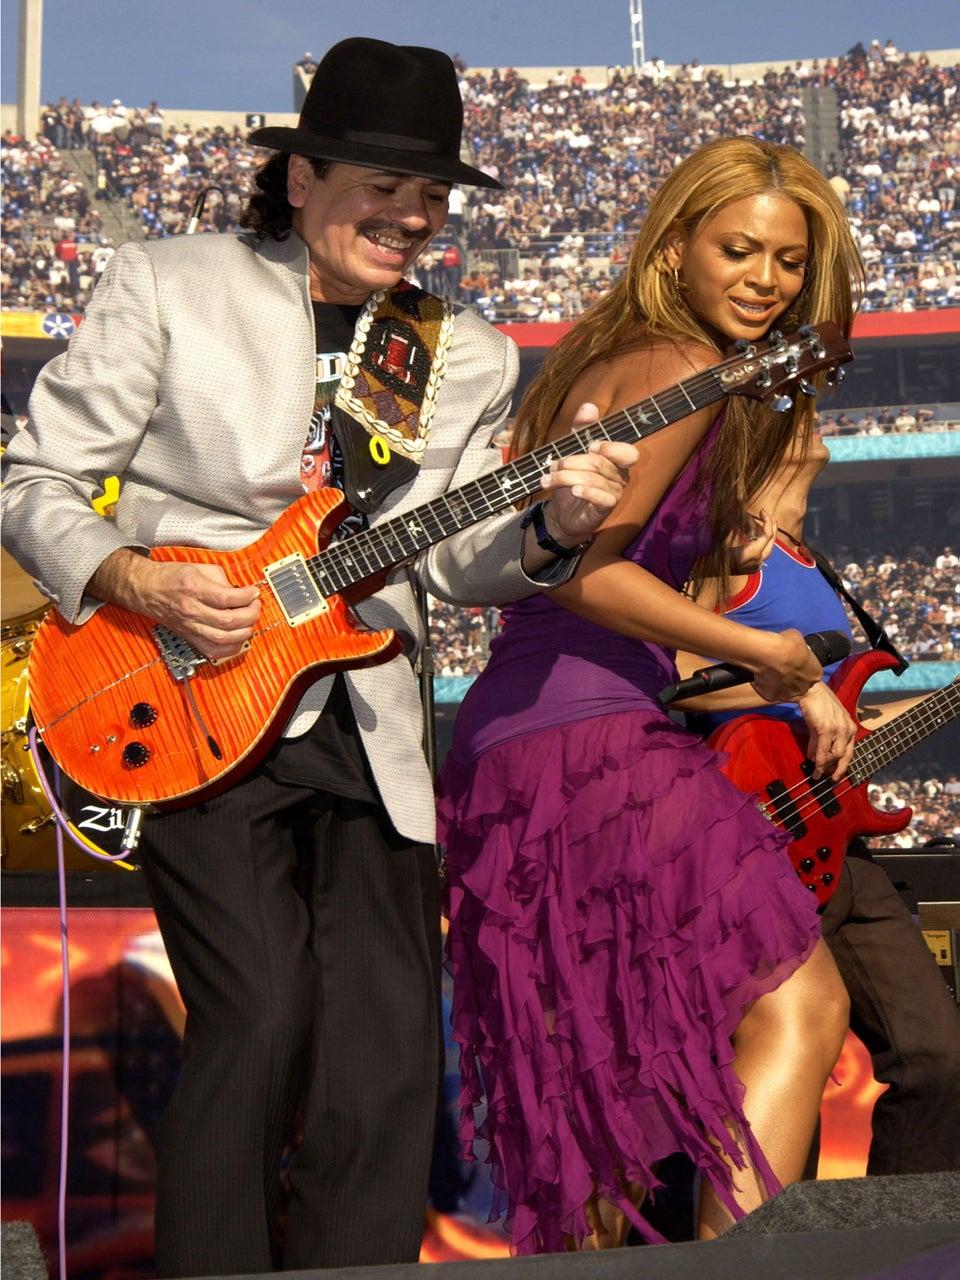 Carlos Santana Thinks Beyoncé Is 'Not A Singer'